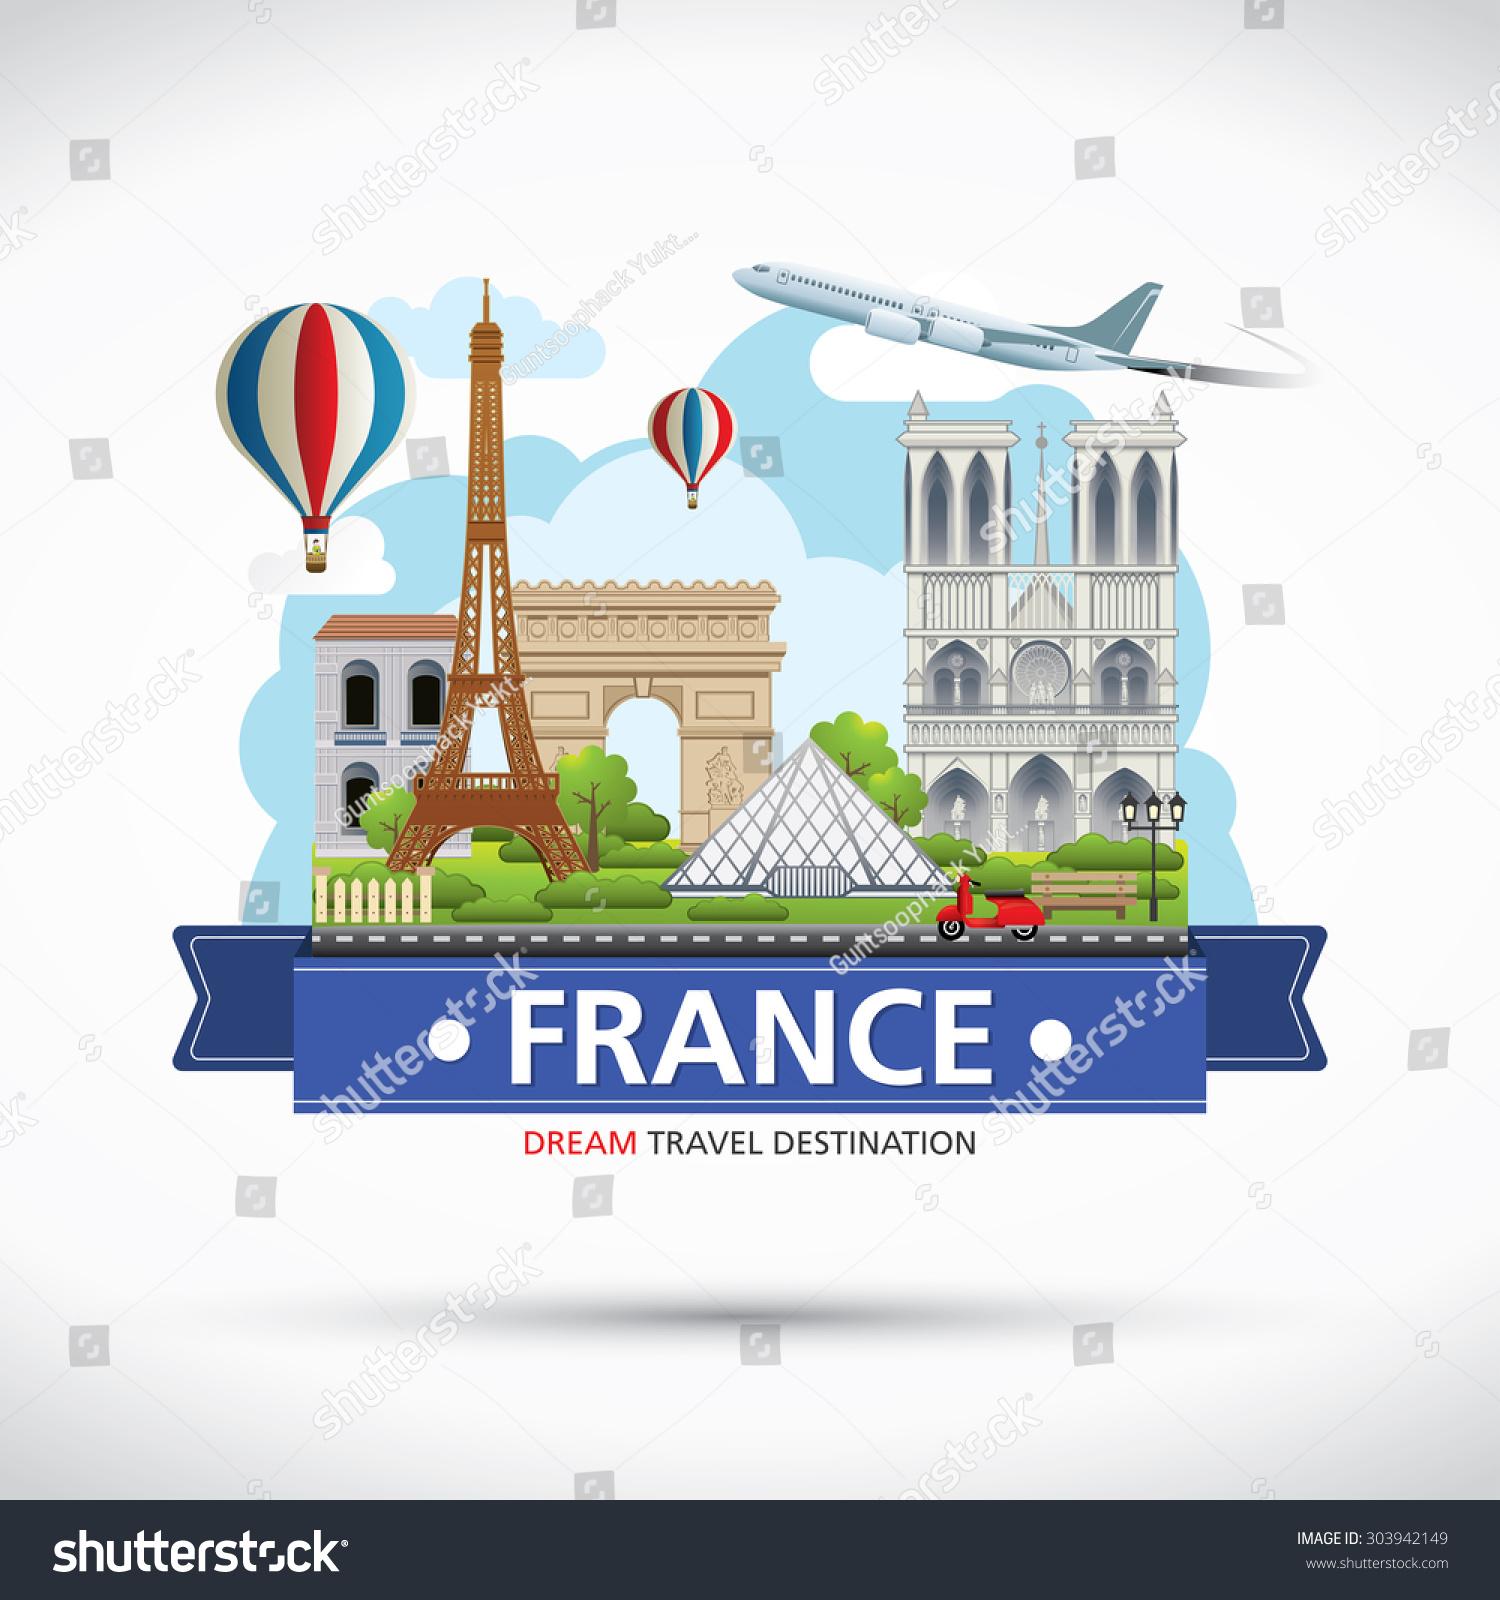 stock vector paris france travel destinations icon info graphic elements traveling